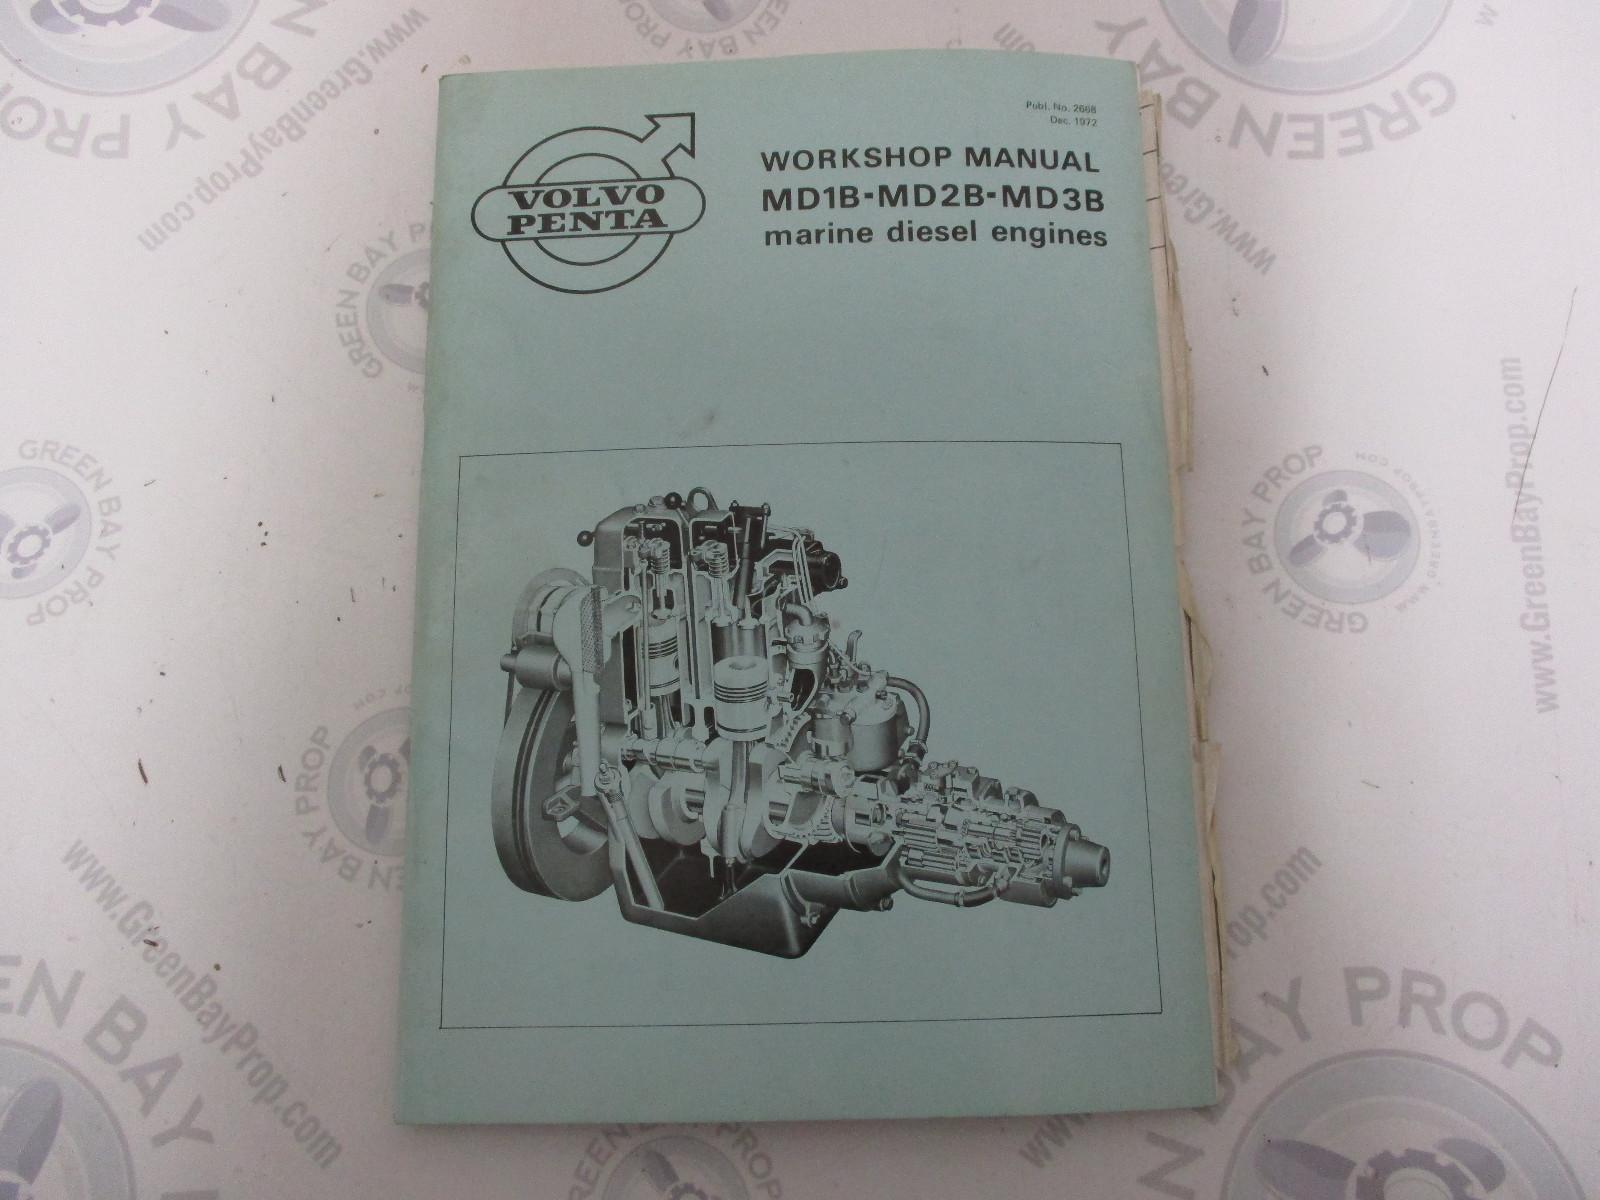 2668 volvo penta service workshop manual md1b 3b marine diesel 2668 volvo penta service workshop manual md1b 3b marine diesel engines 1972 publicscrutiny Images